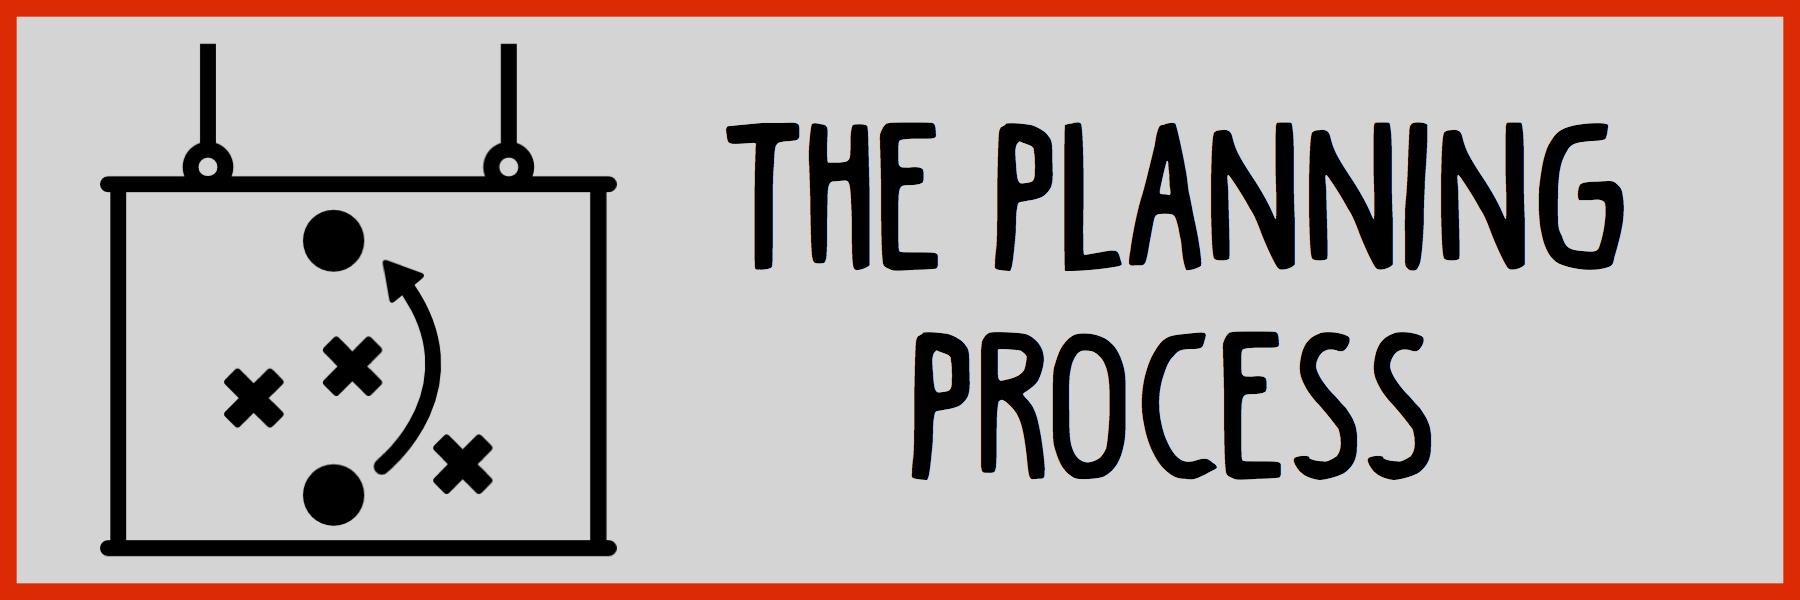 Process copy.jpg